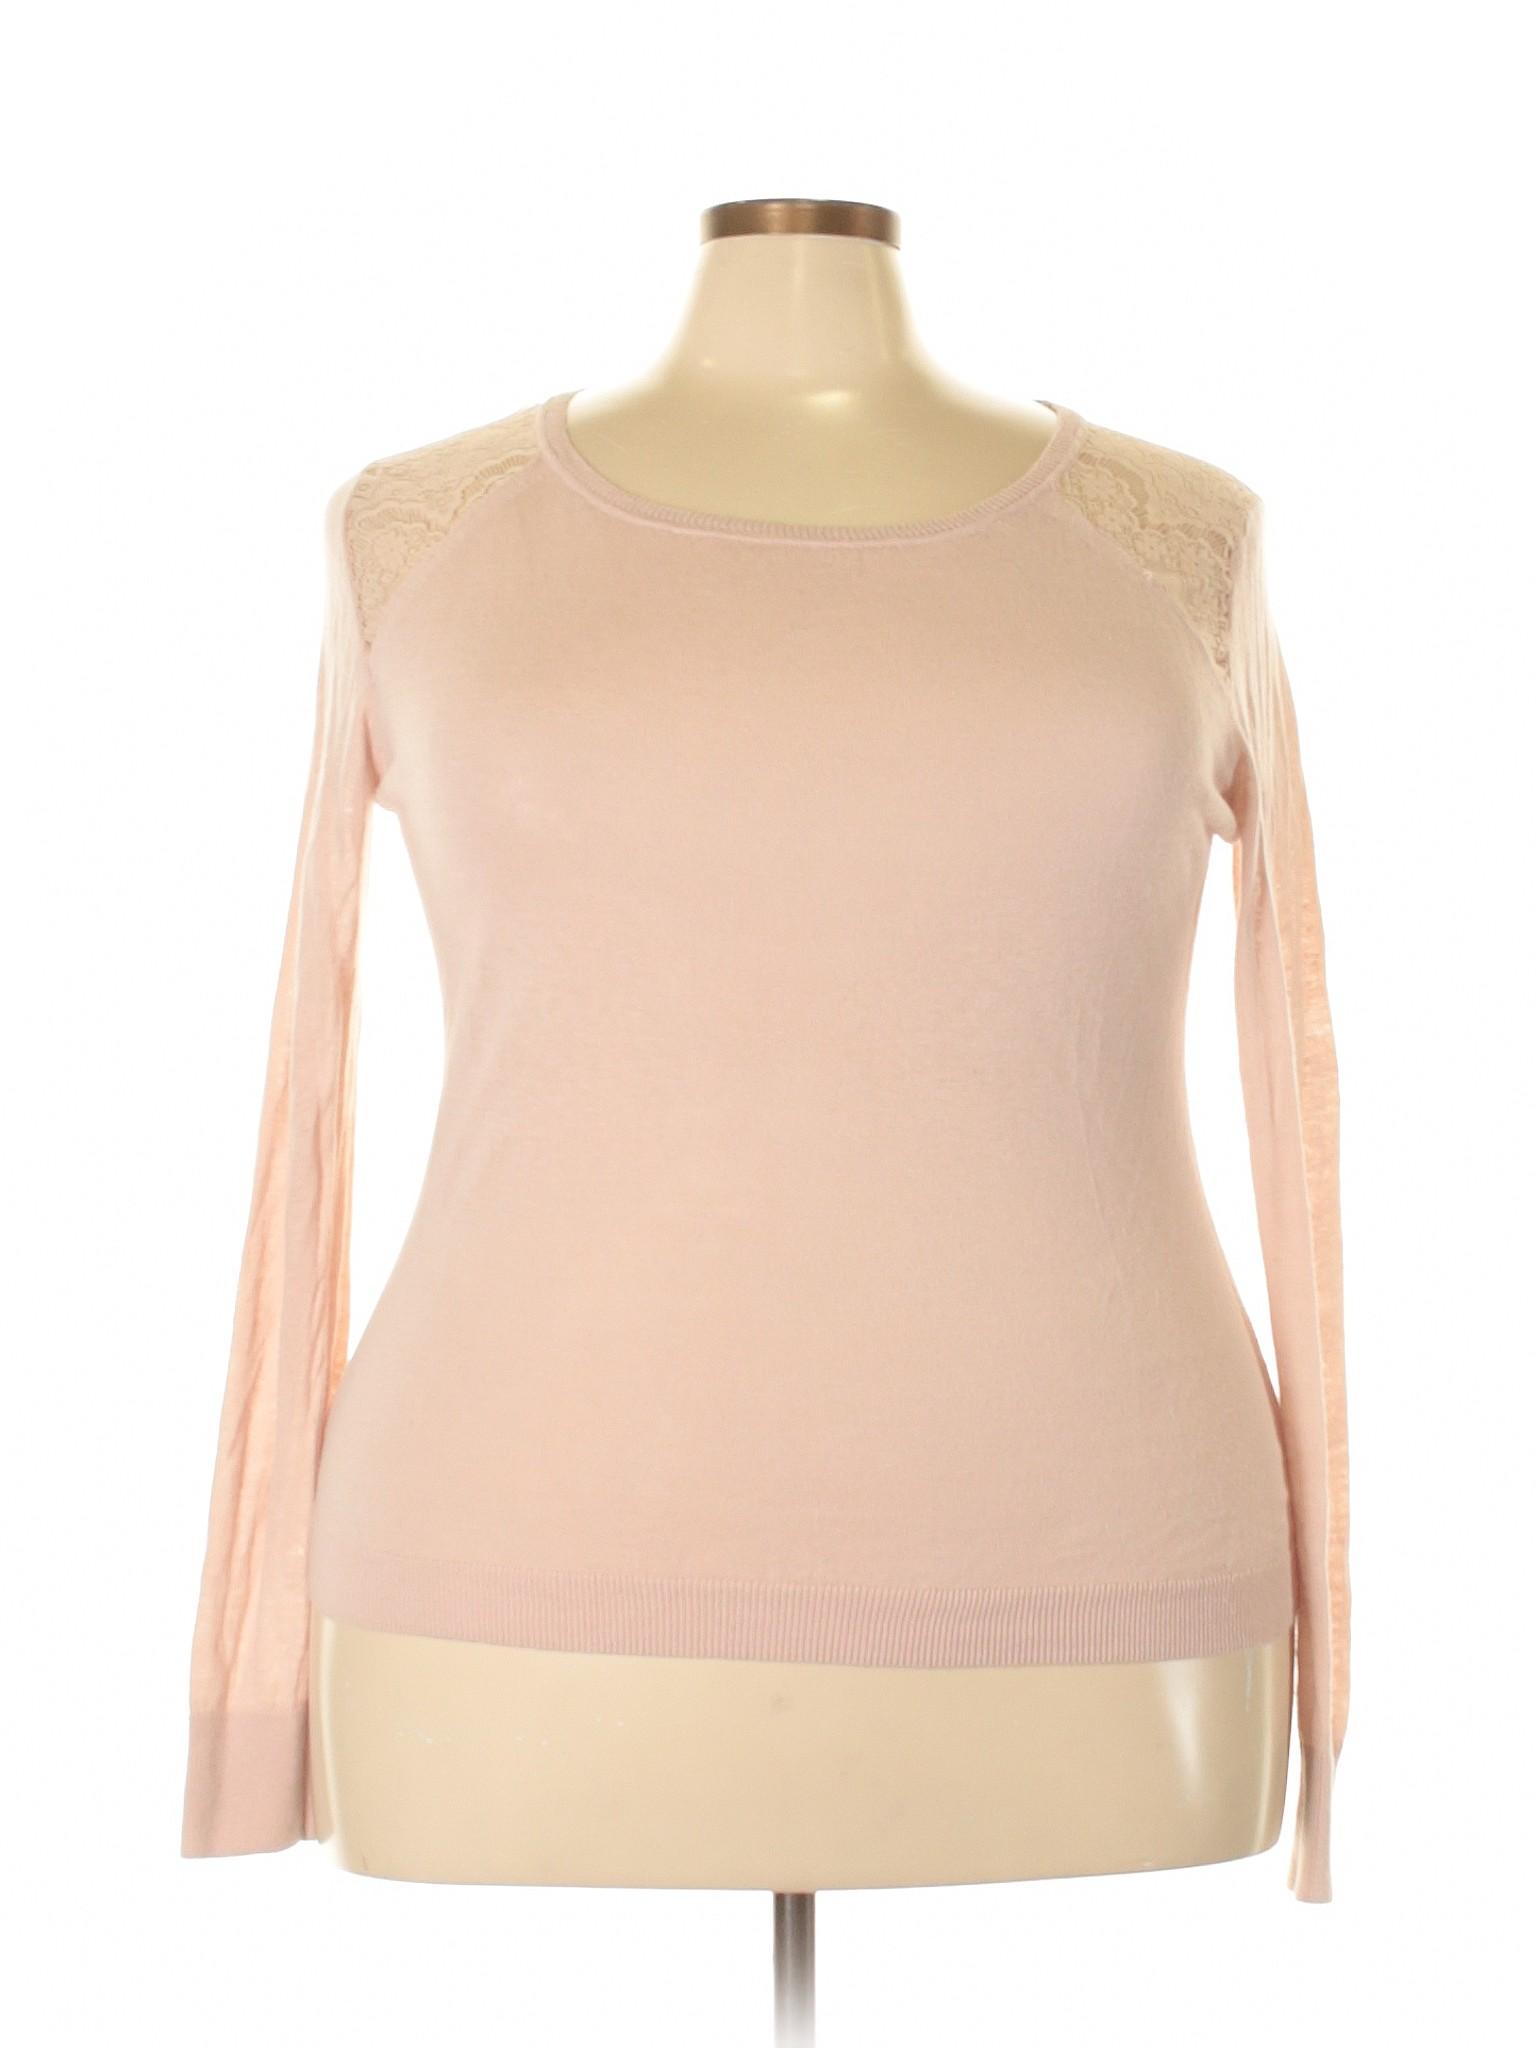 Pullover winter Boutique Ann Taylor Sweater LOFT I8xBqwz